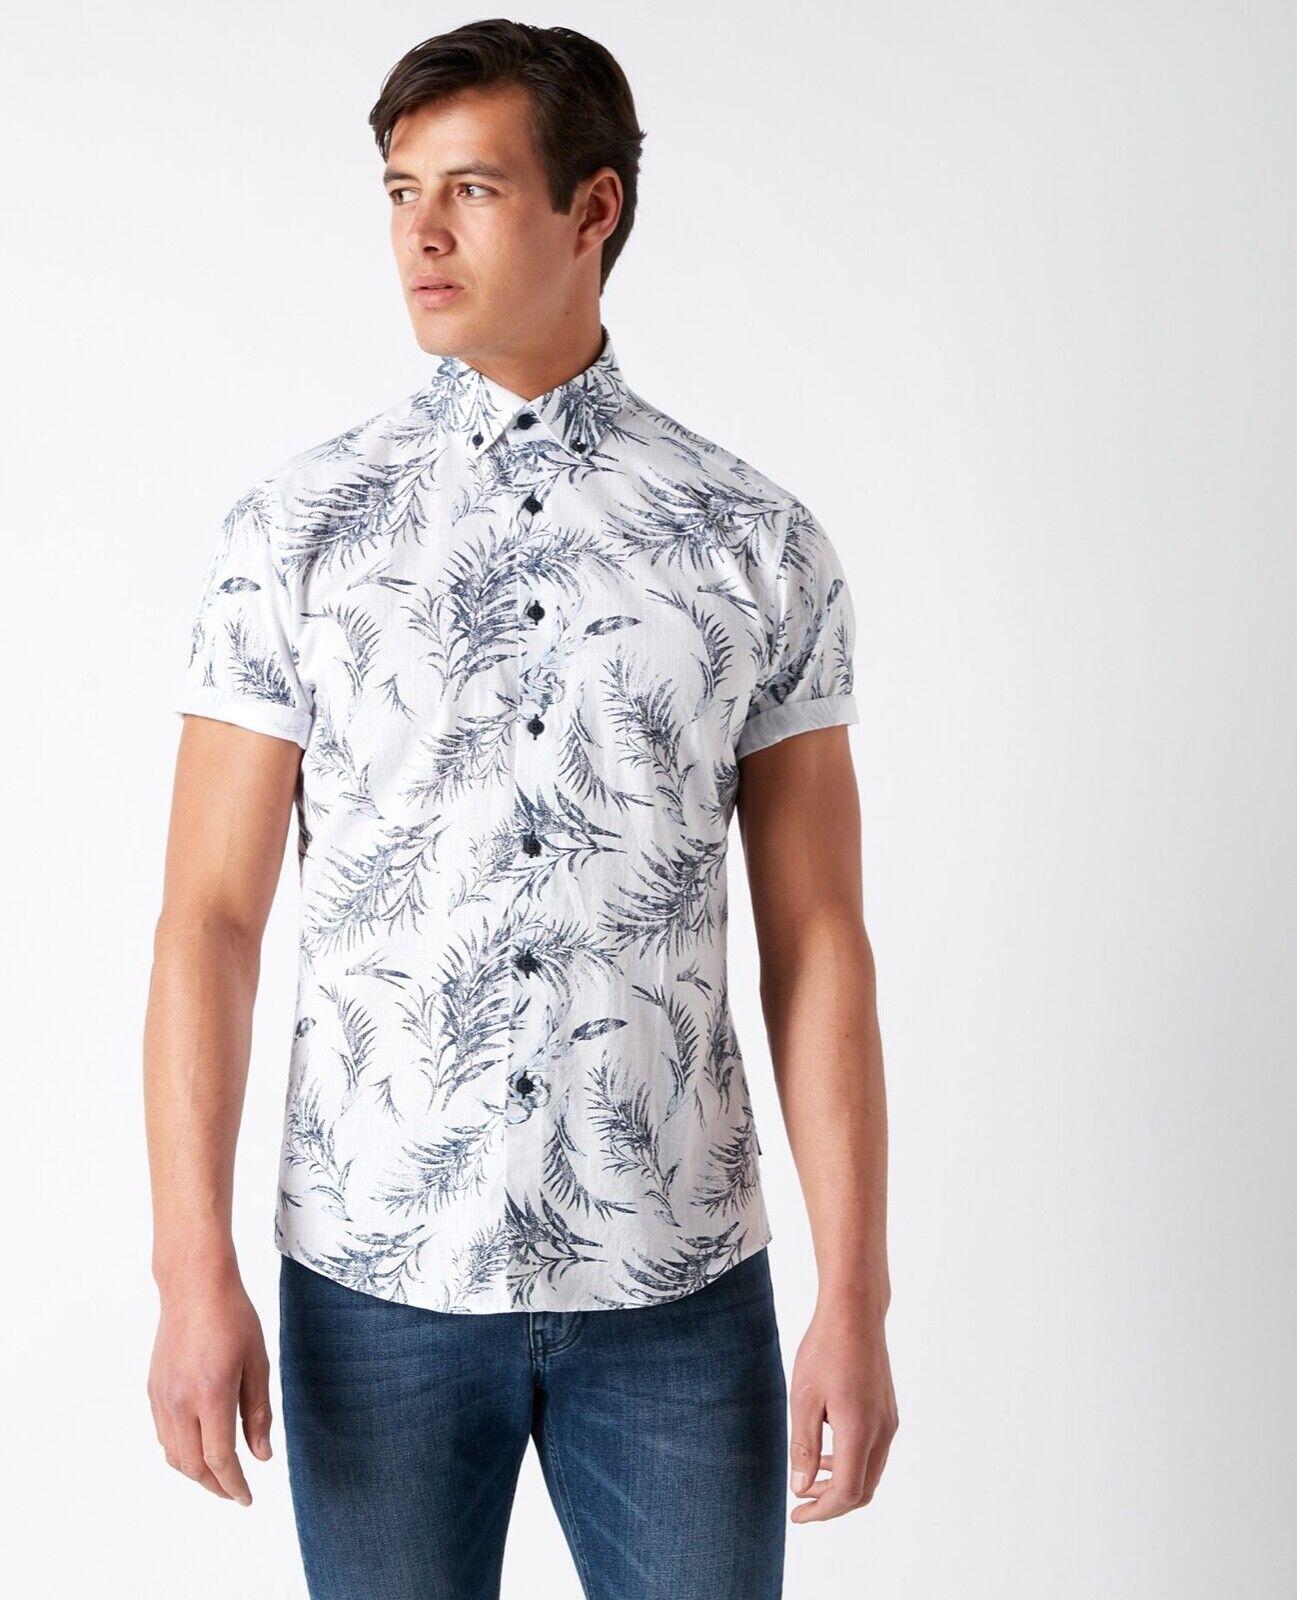 REMUS men® Printed Summer Shirt White - Medium New SS19